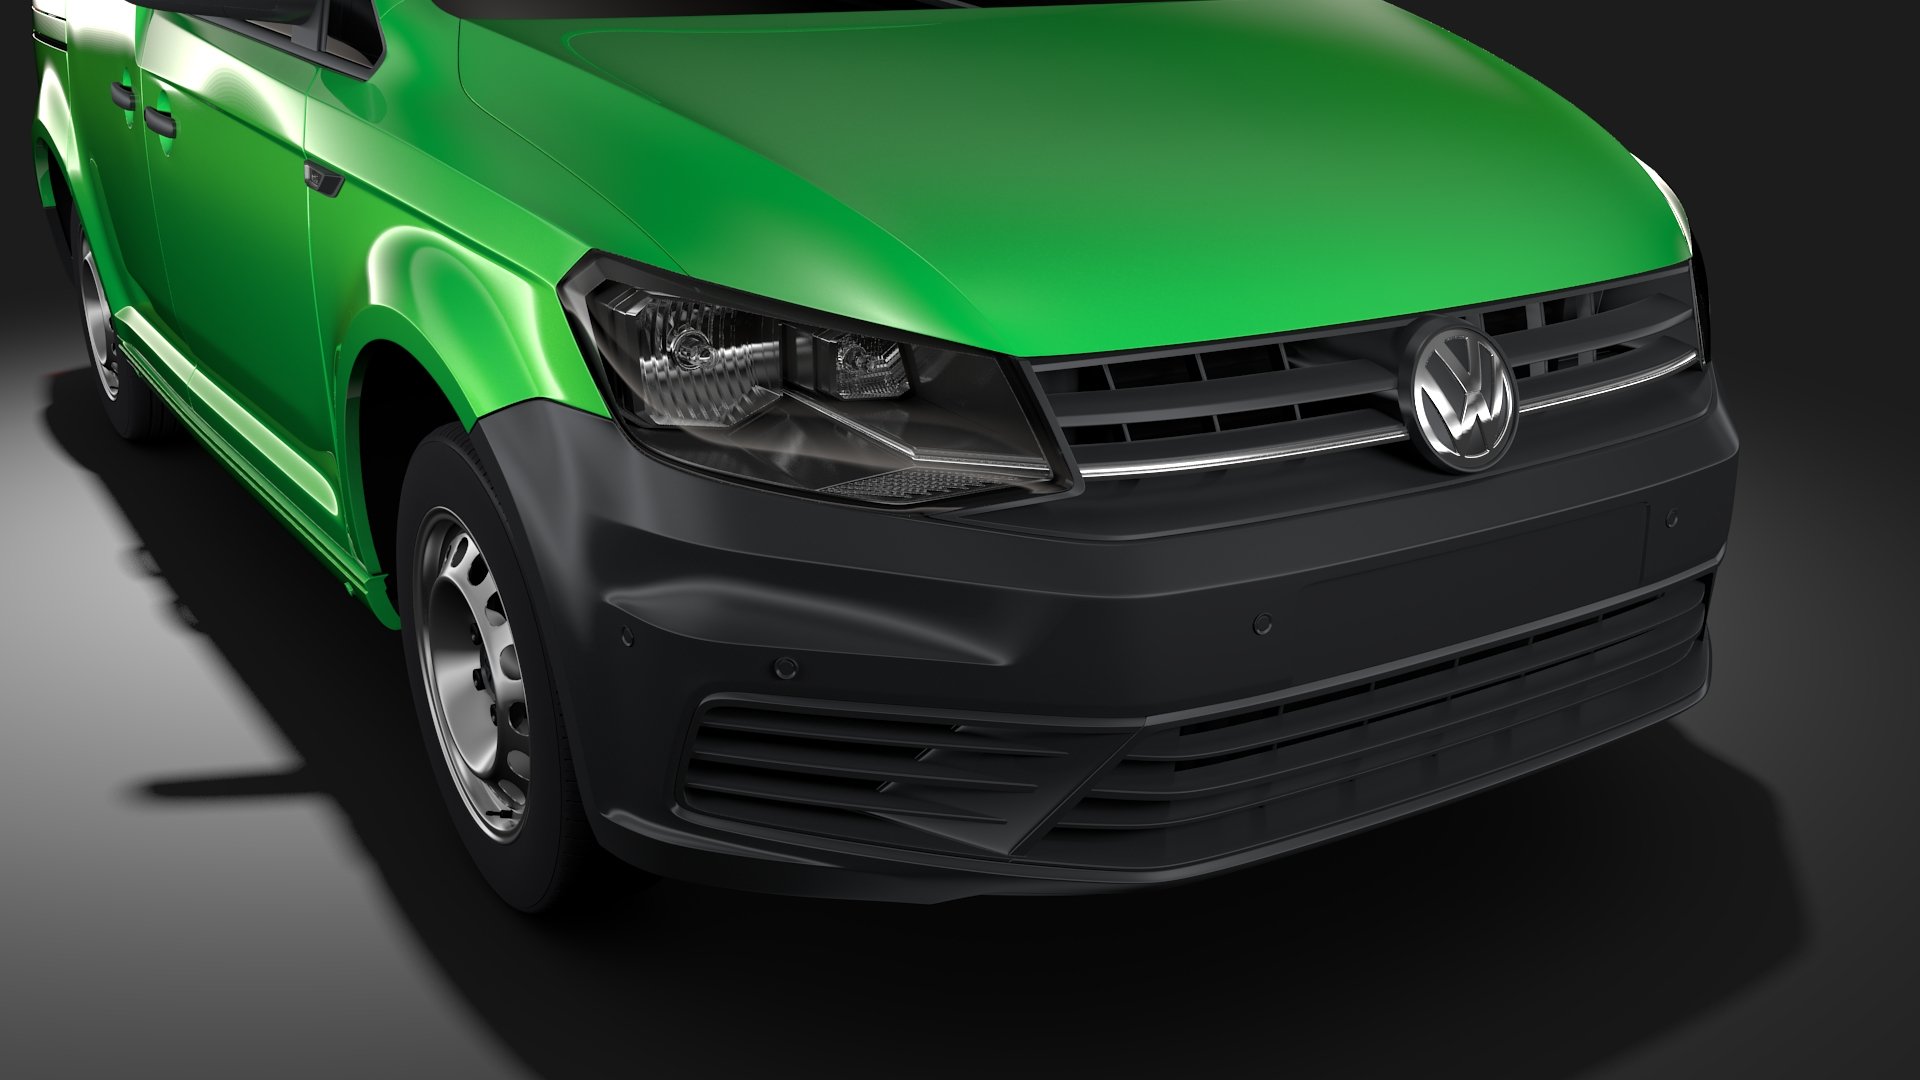 volkswagen caddy panel van l1 2017 3d model flatpyramid. Black Bedroom Furniture Sets. Home Design Ideas